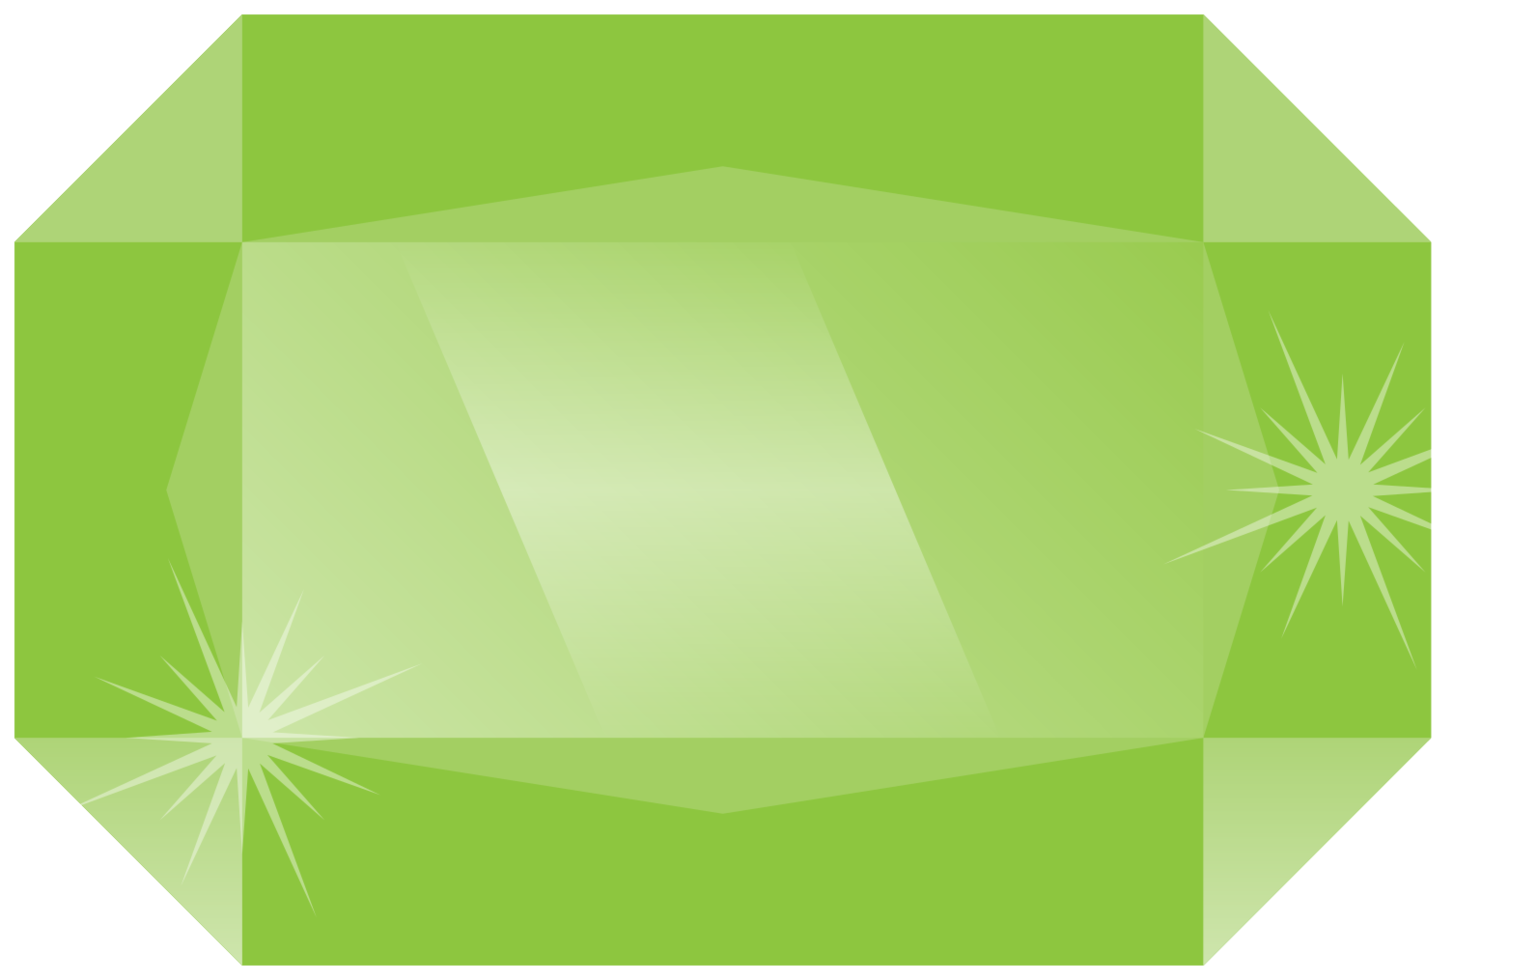 gemma di diamante png